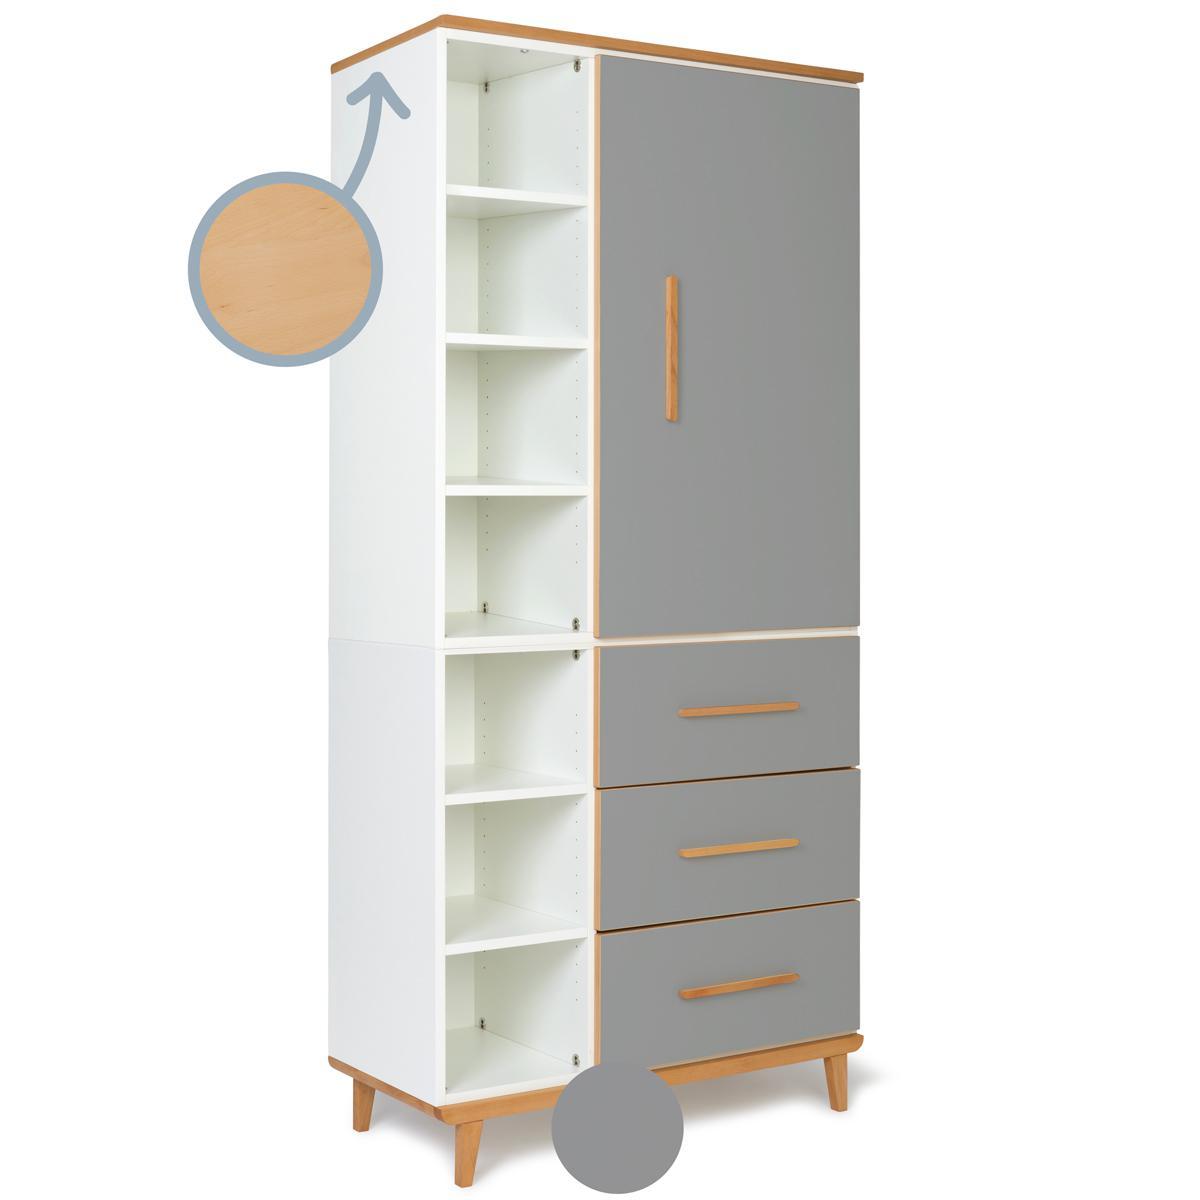 Armoire 198cm 1 porte 3 tiroirs NADO slate grey